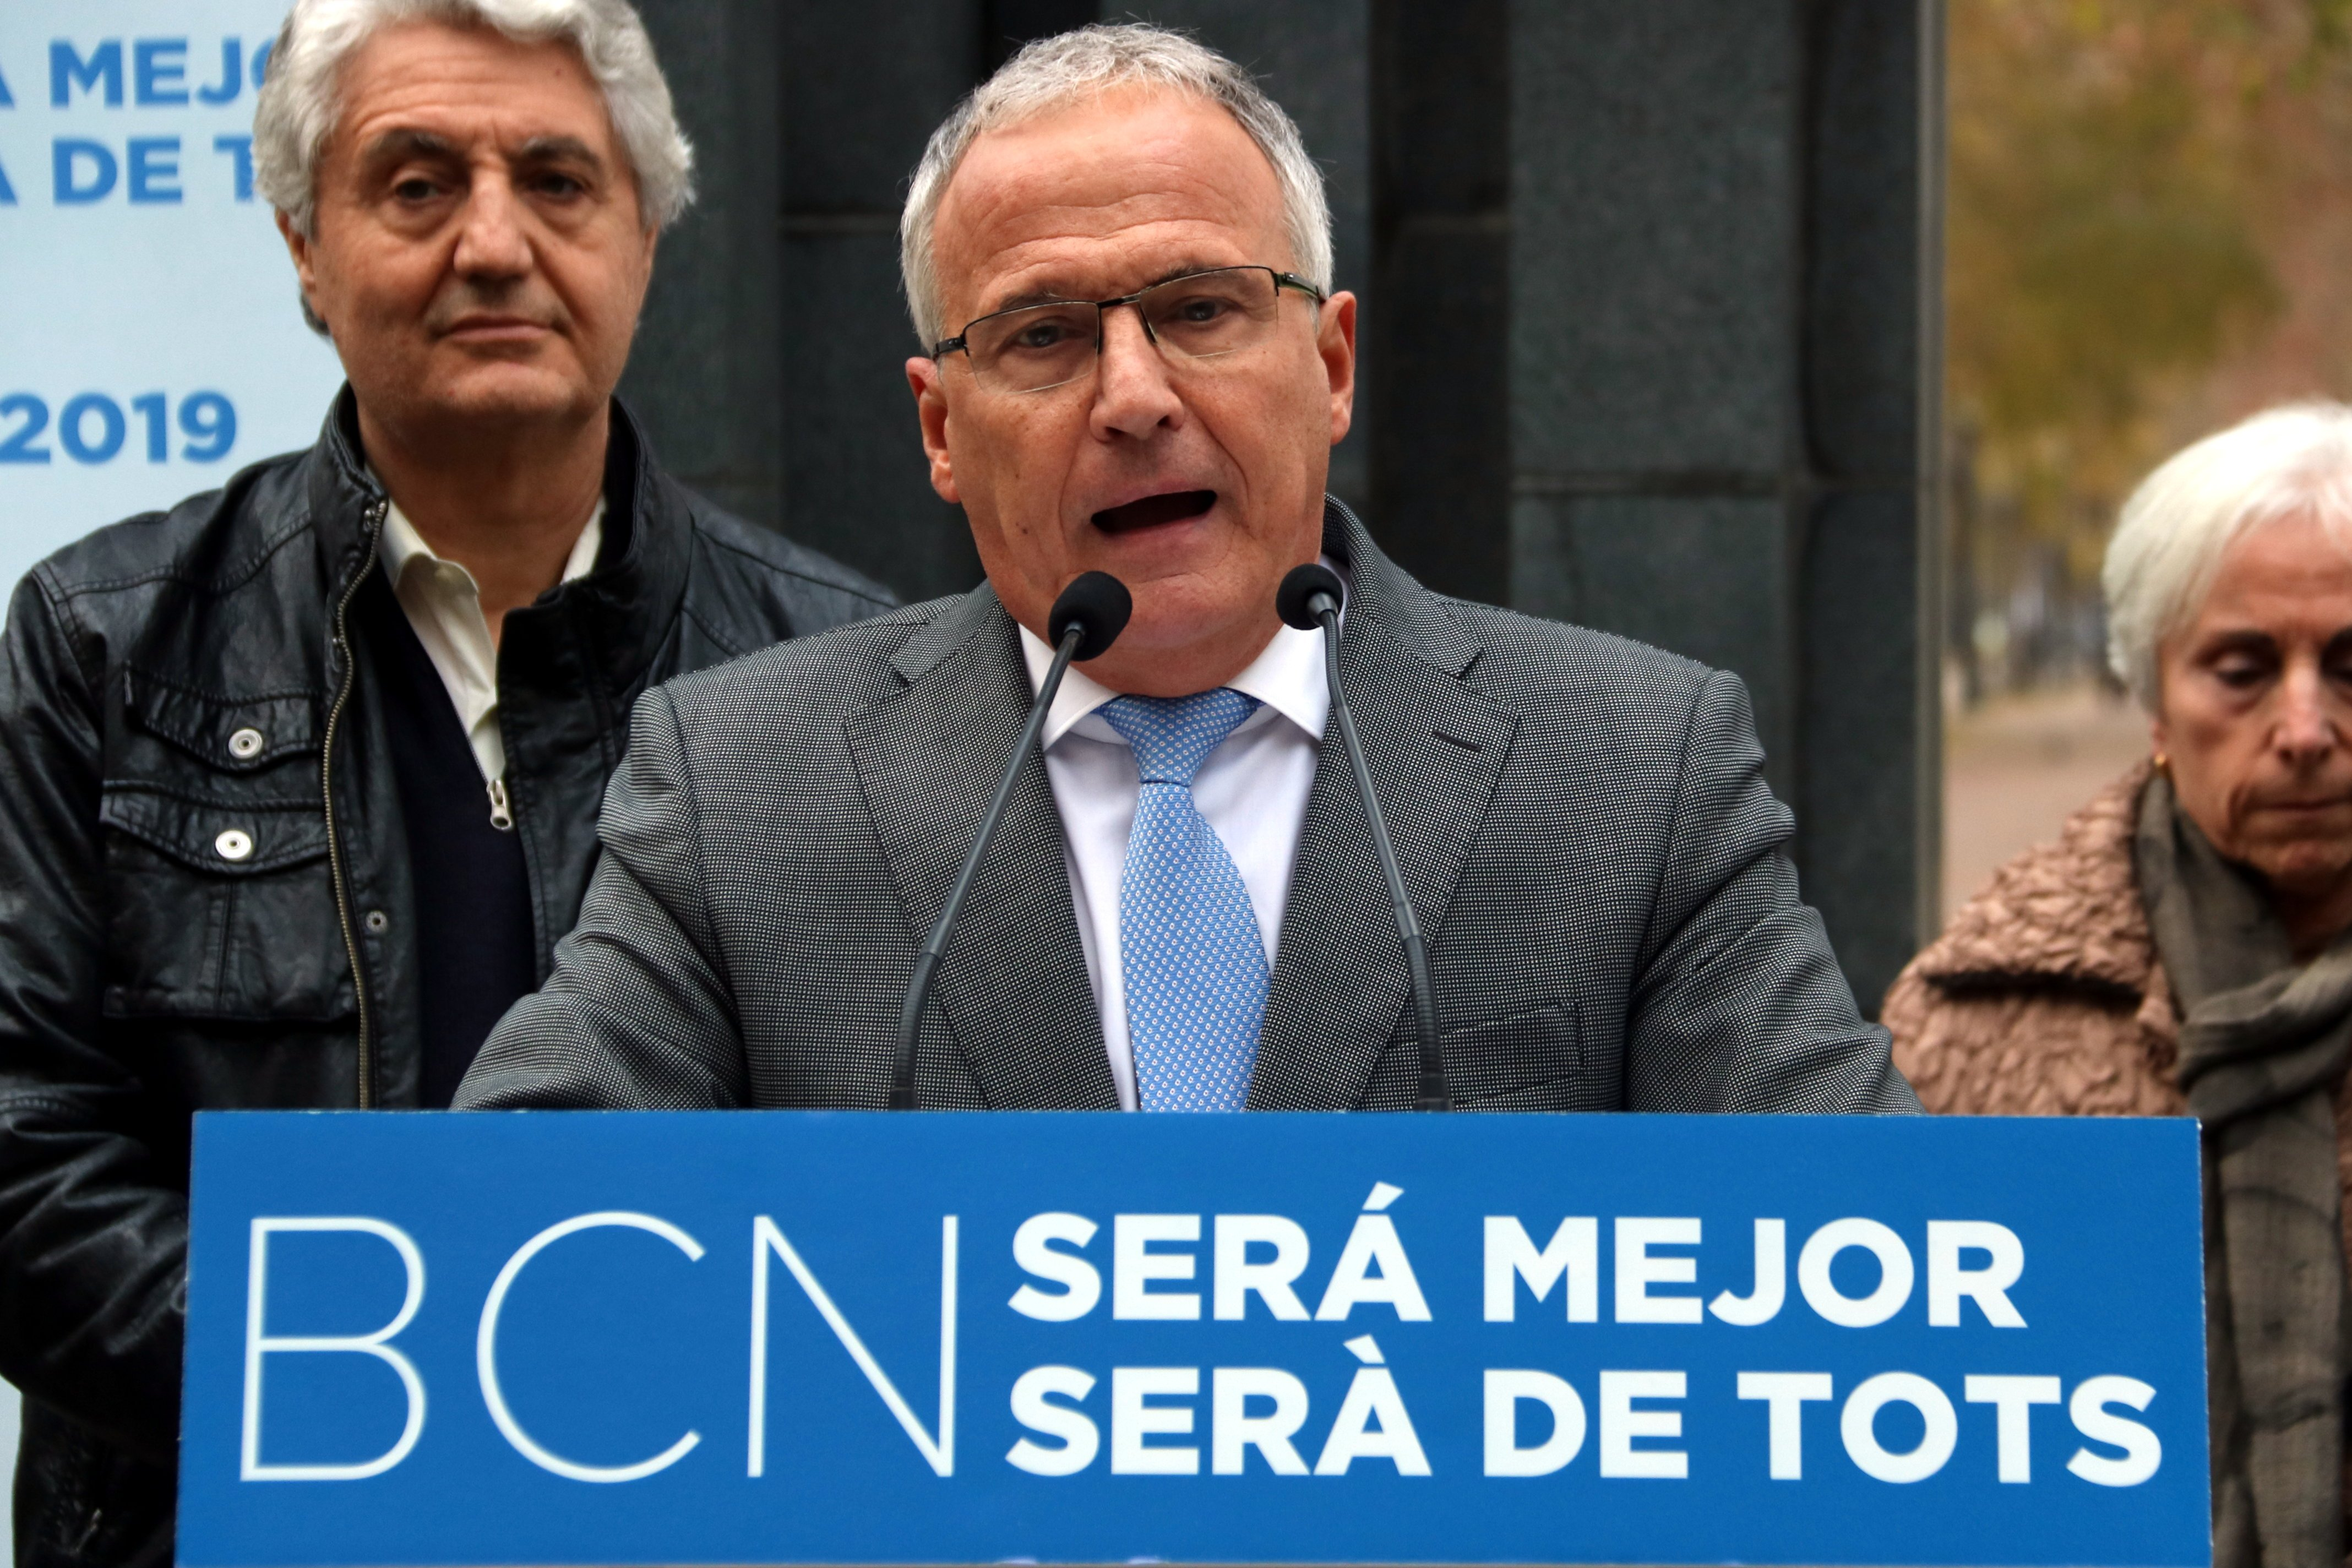 josep bou candidat pp barcelona acn